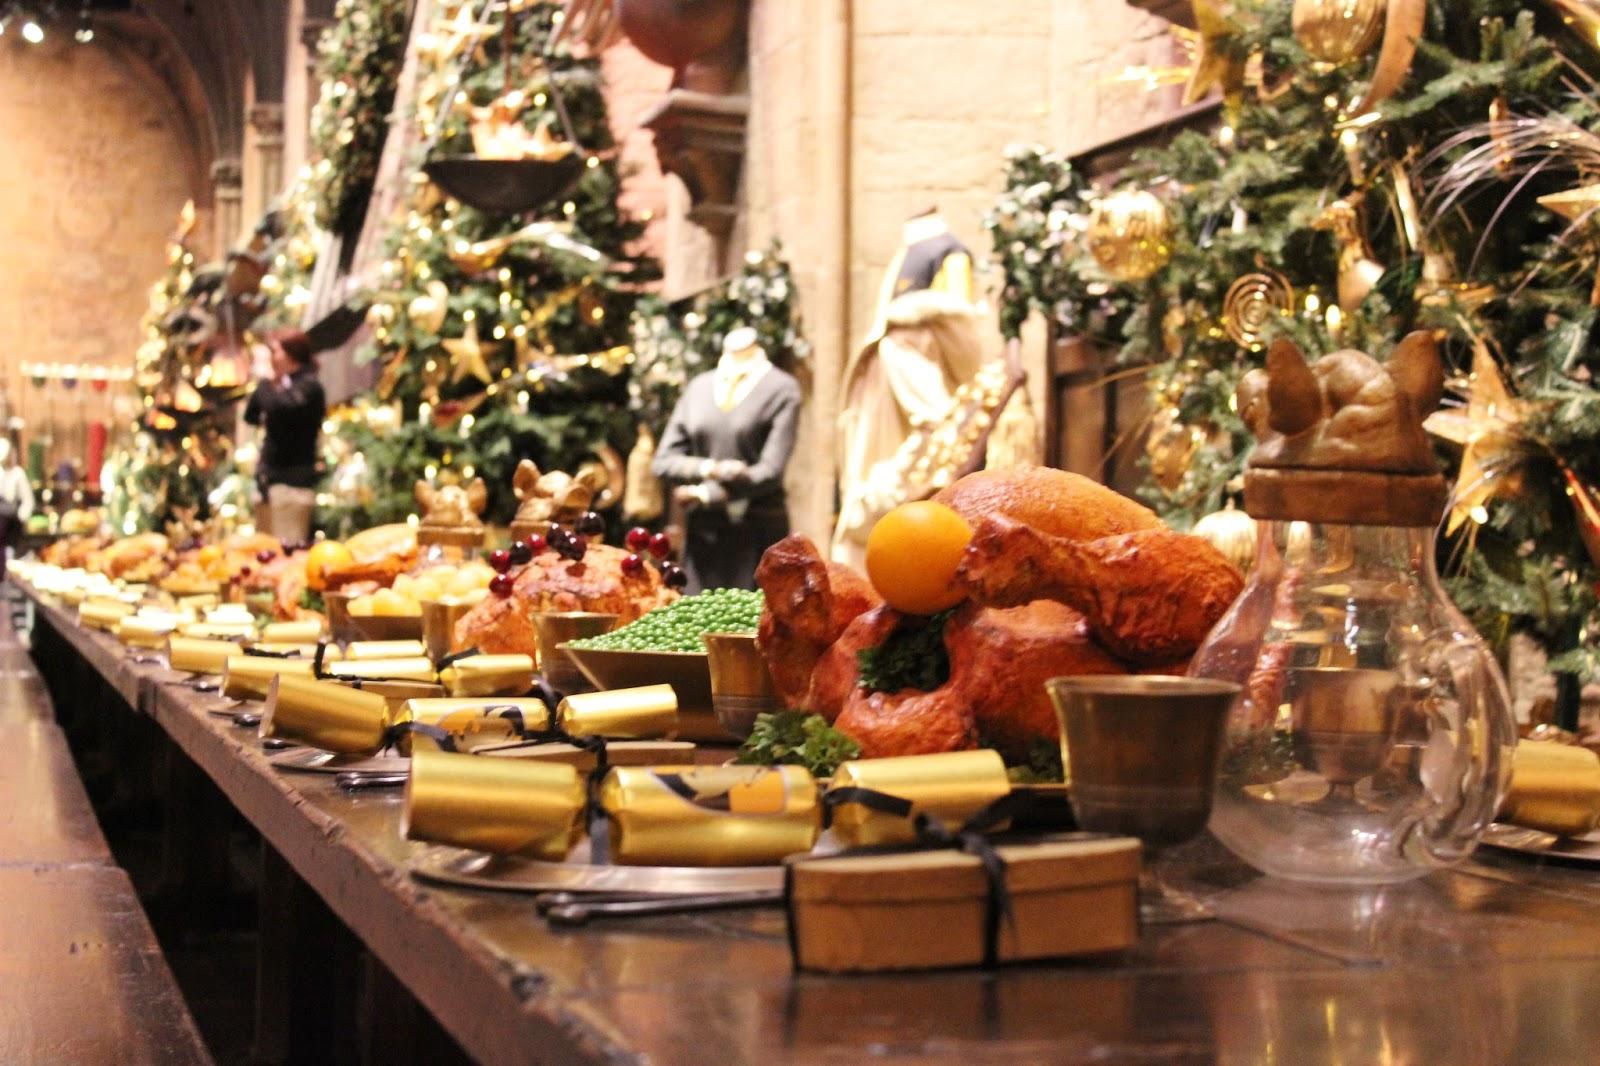 Lifestyle Harry Potter Studio Tour The Festive Edition